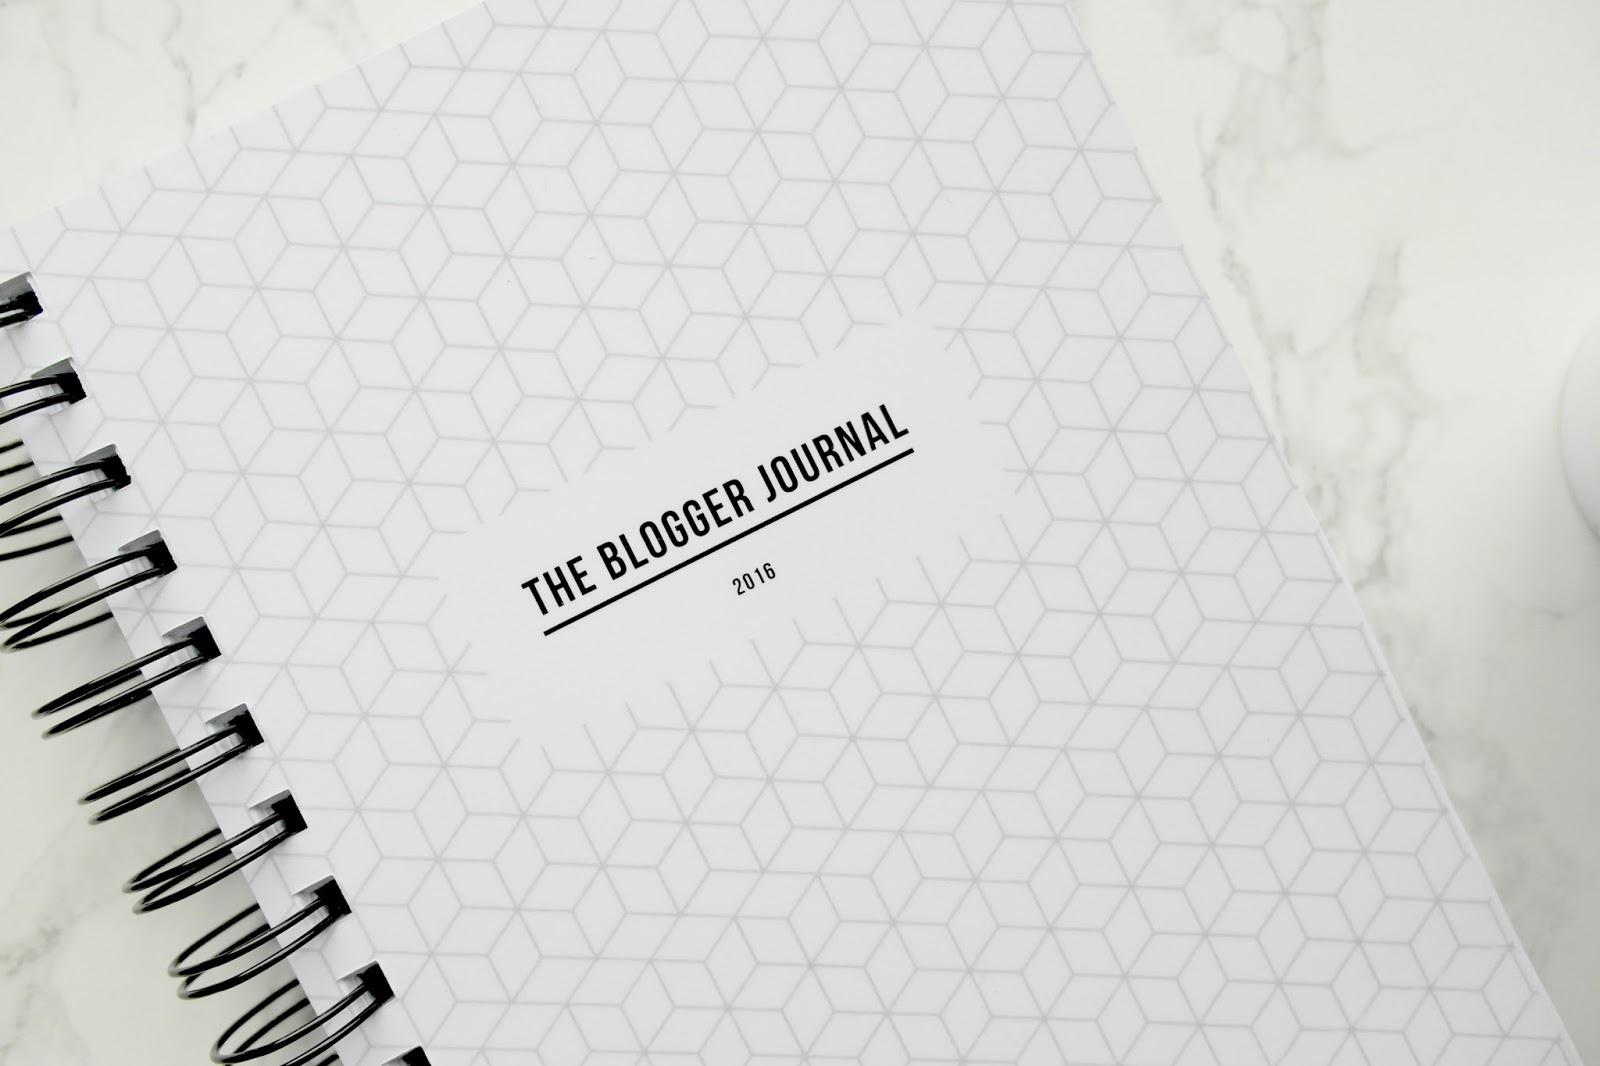 THE BLOGGER JOURNAL